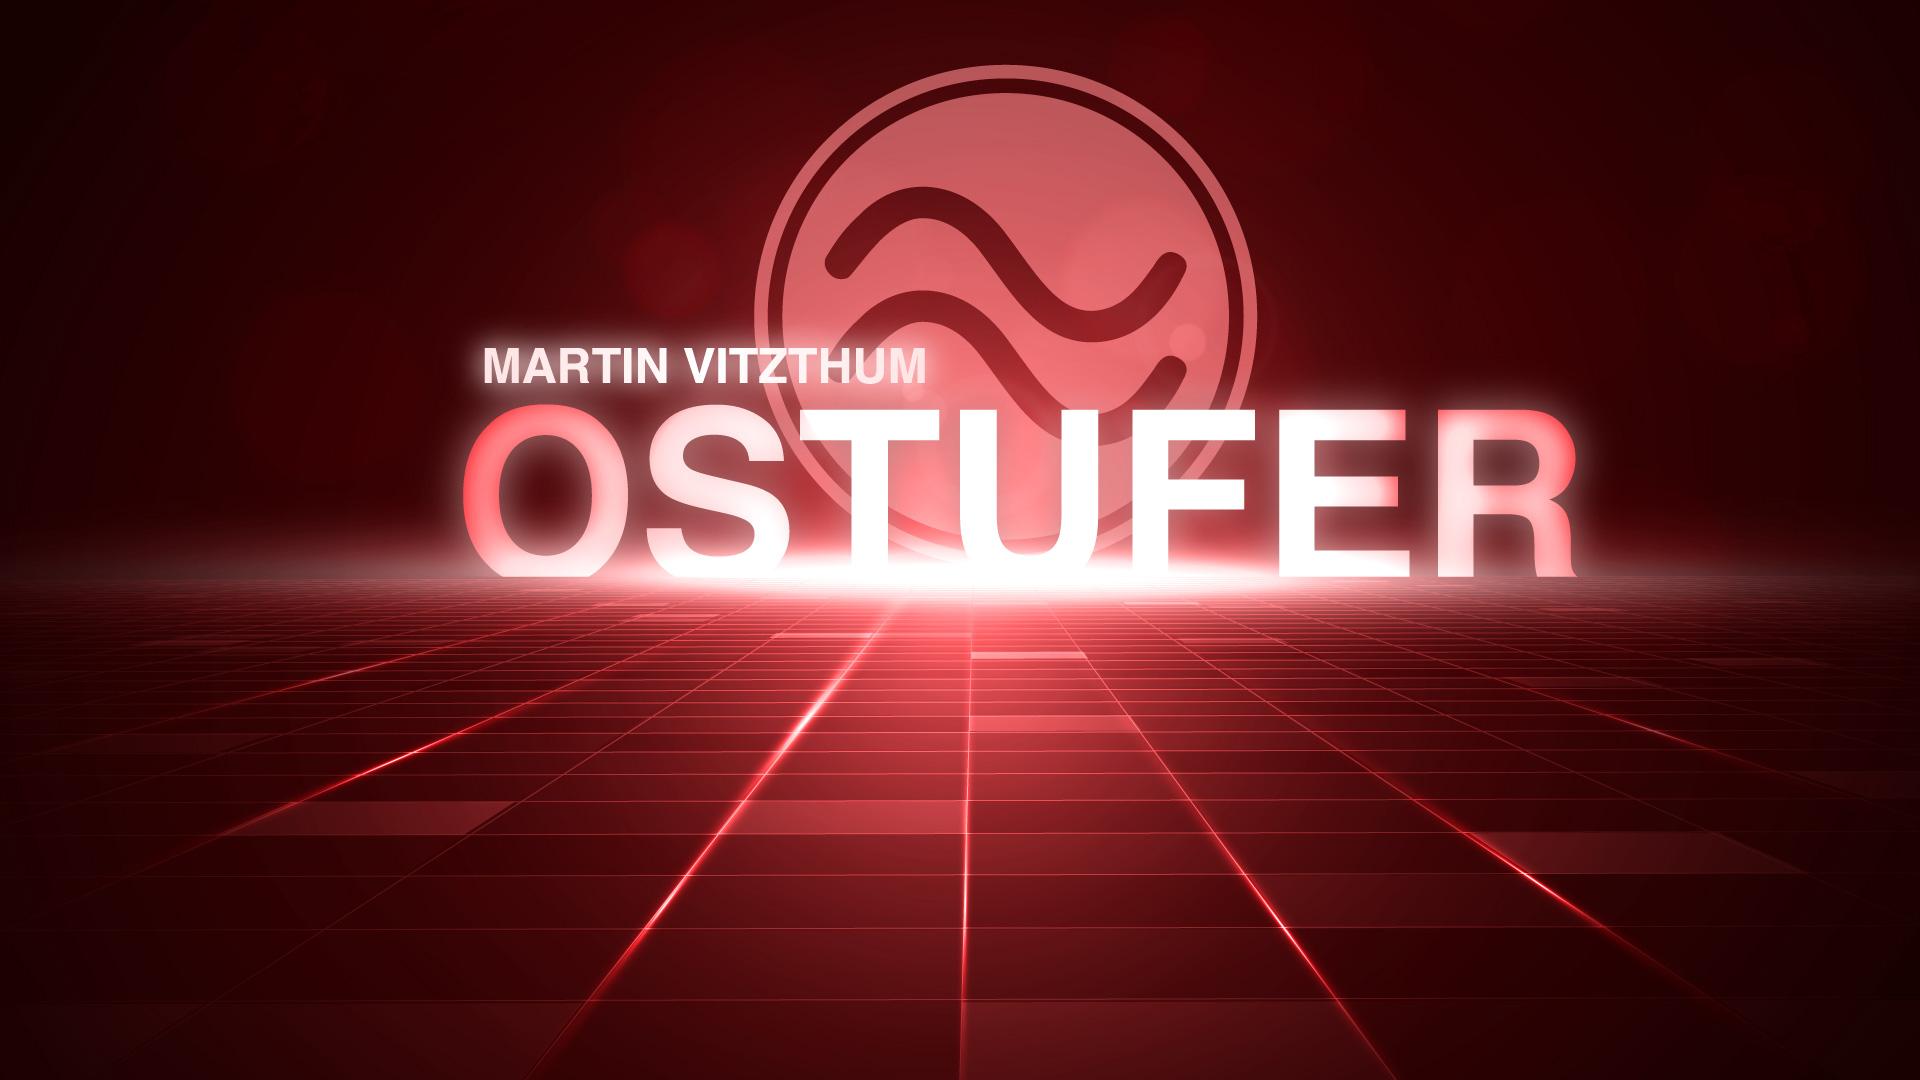 OSTUFER mit MARTIN VITZTHUM